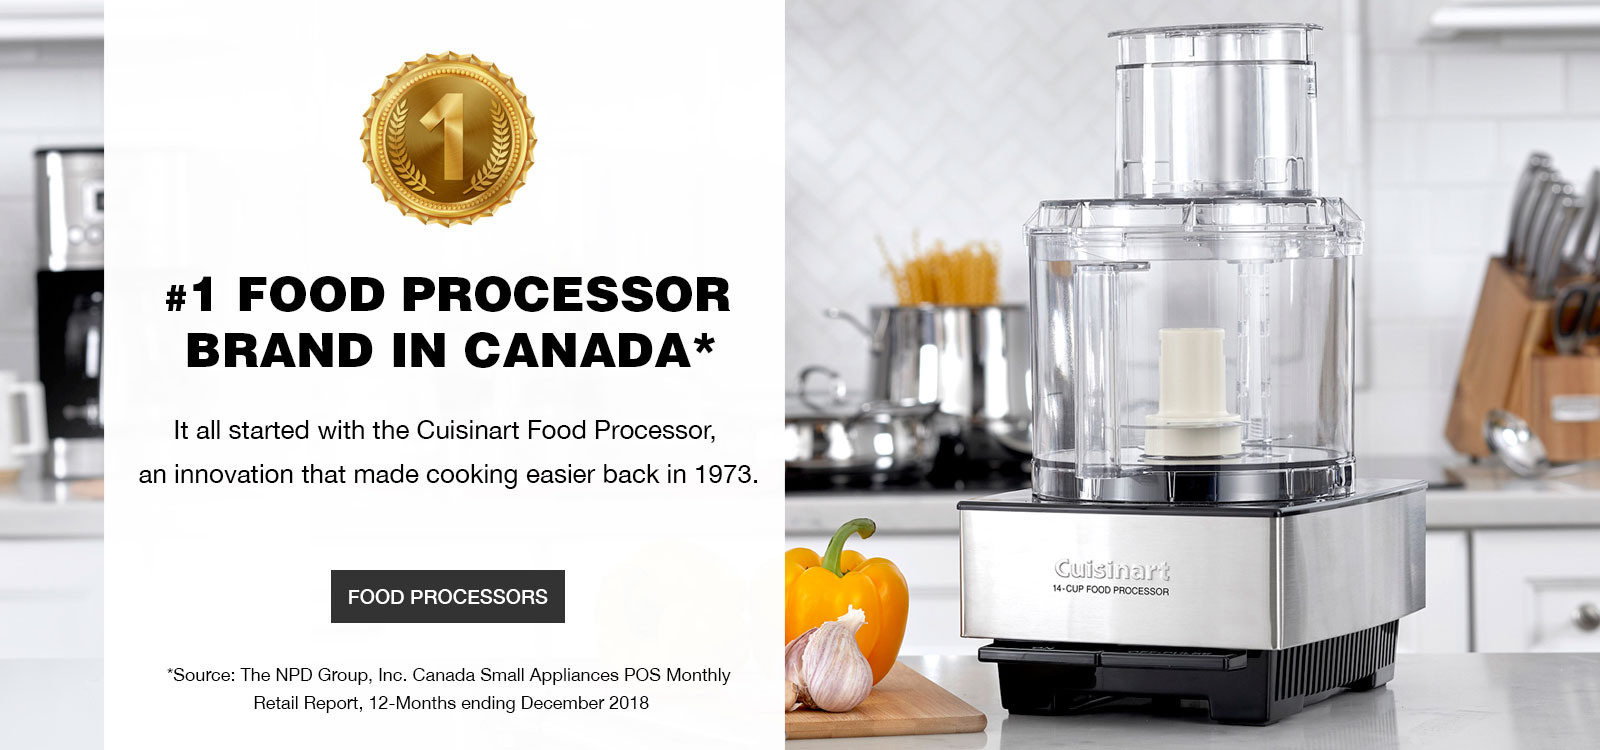 Food Processor Category